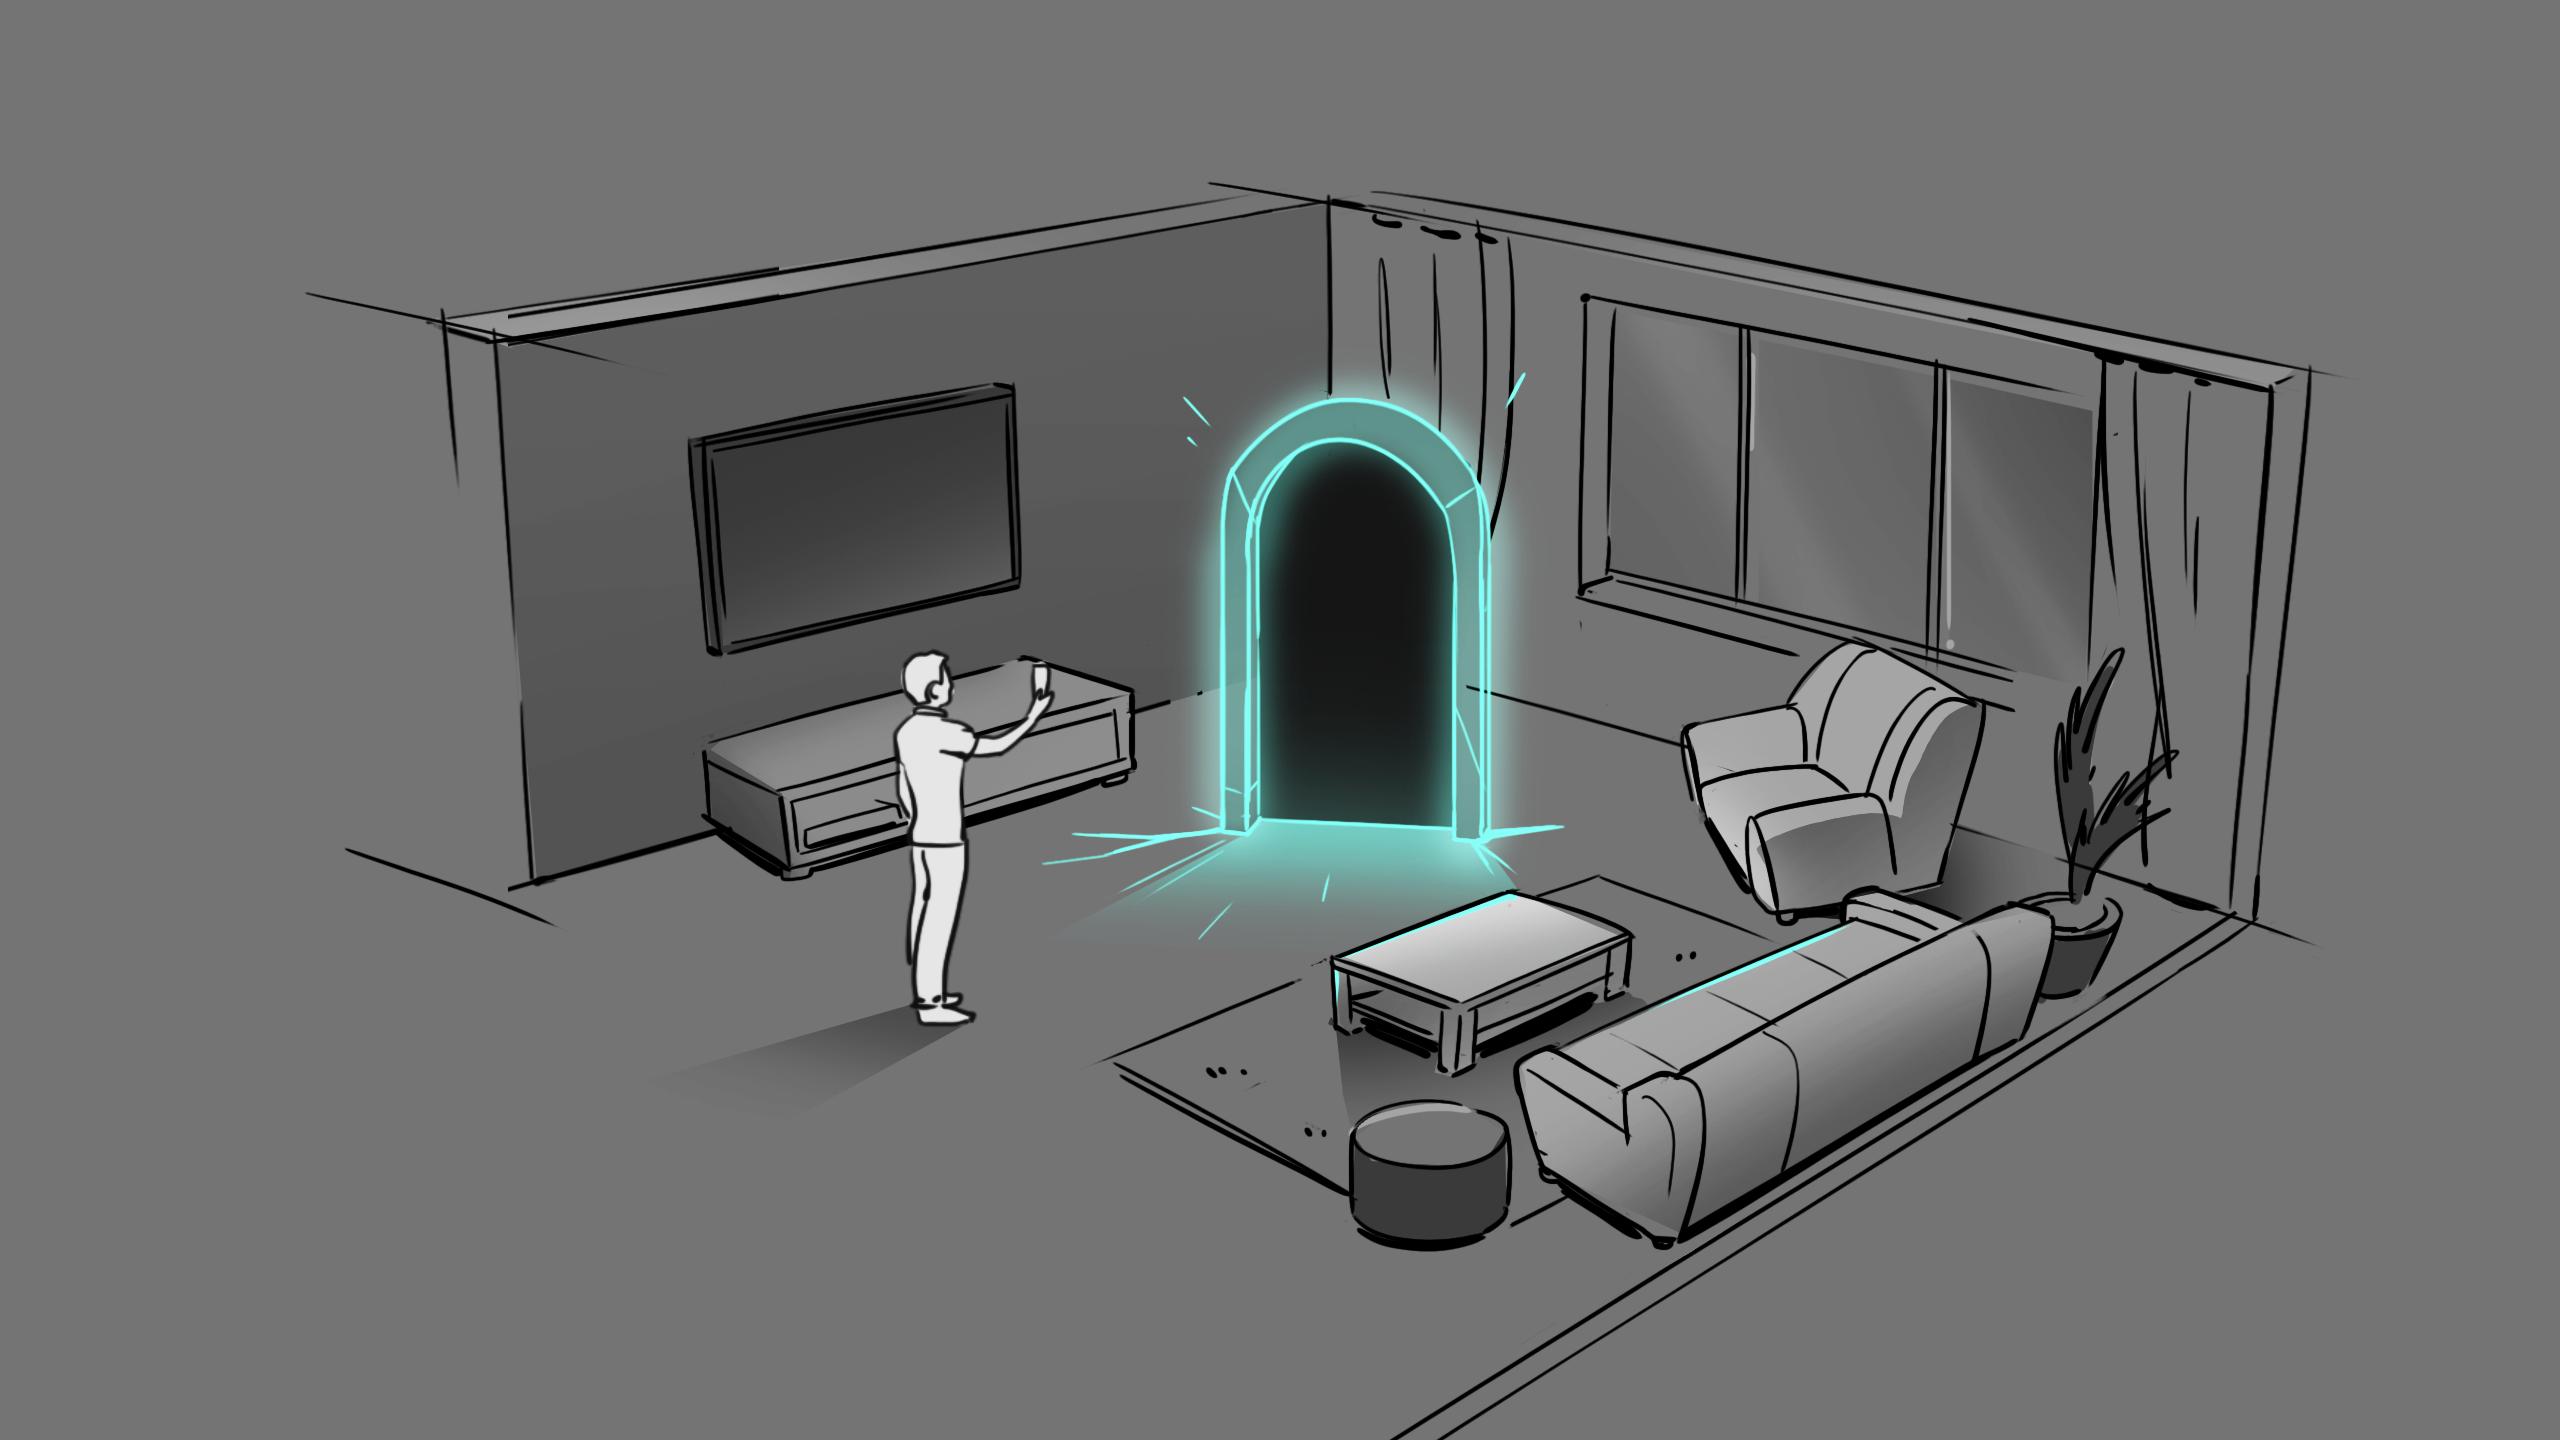 pharos_portal_sketch